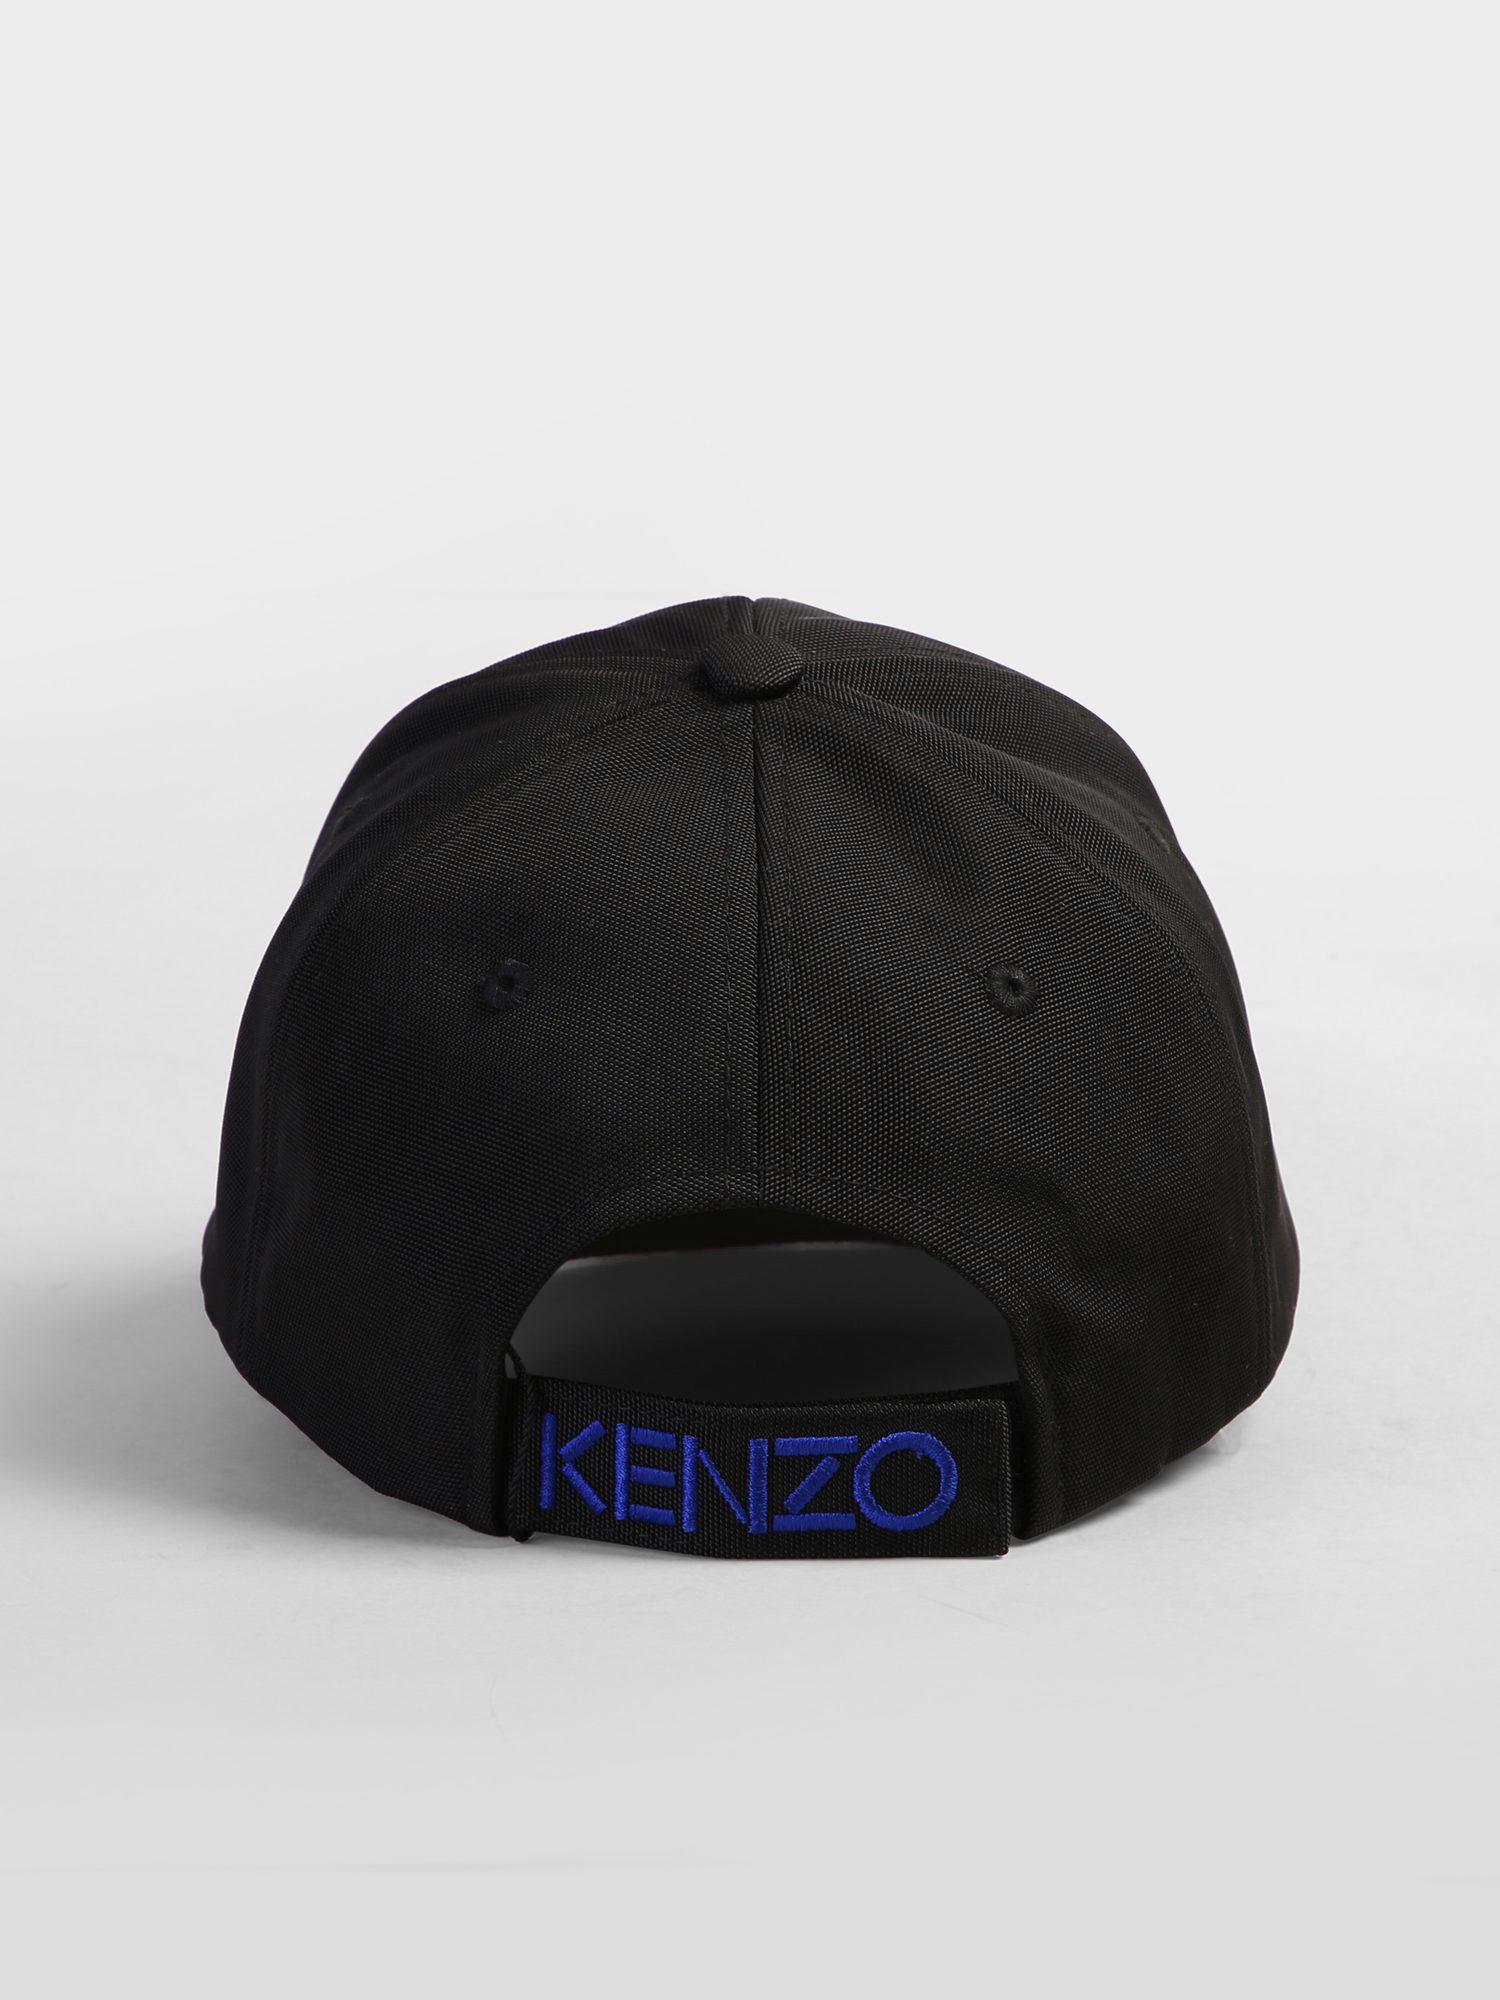 680f1f0270b KENZO - Black Embroidered Cotton Canvas Baseball Hat for Men - Lyst. View  fullscreen